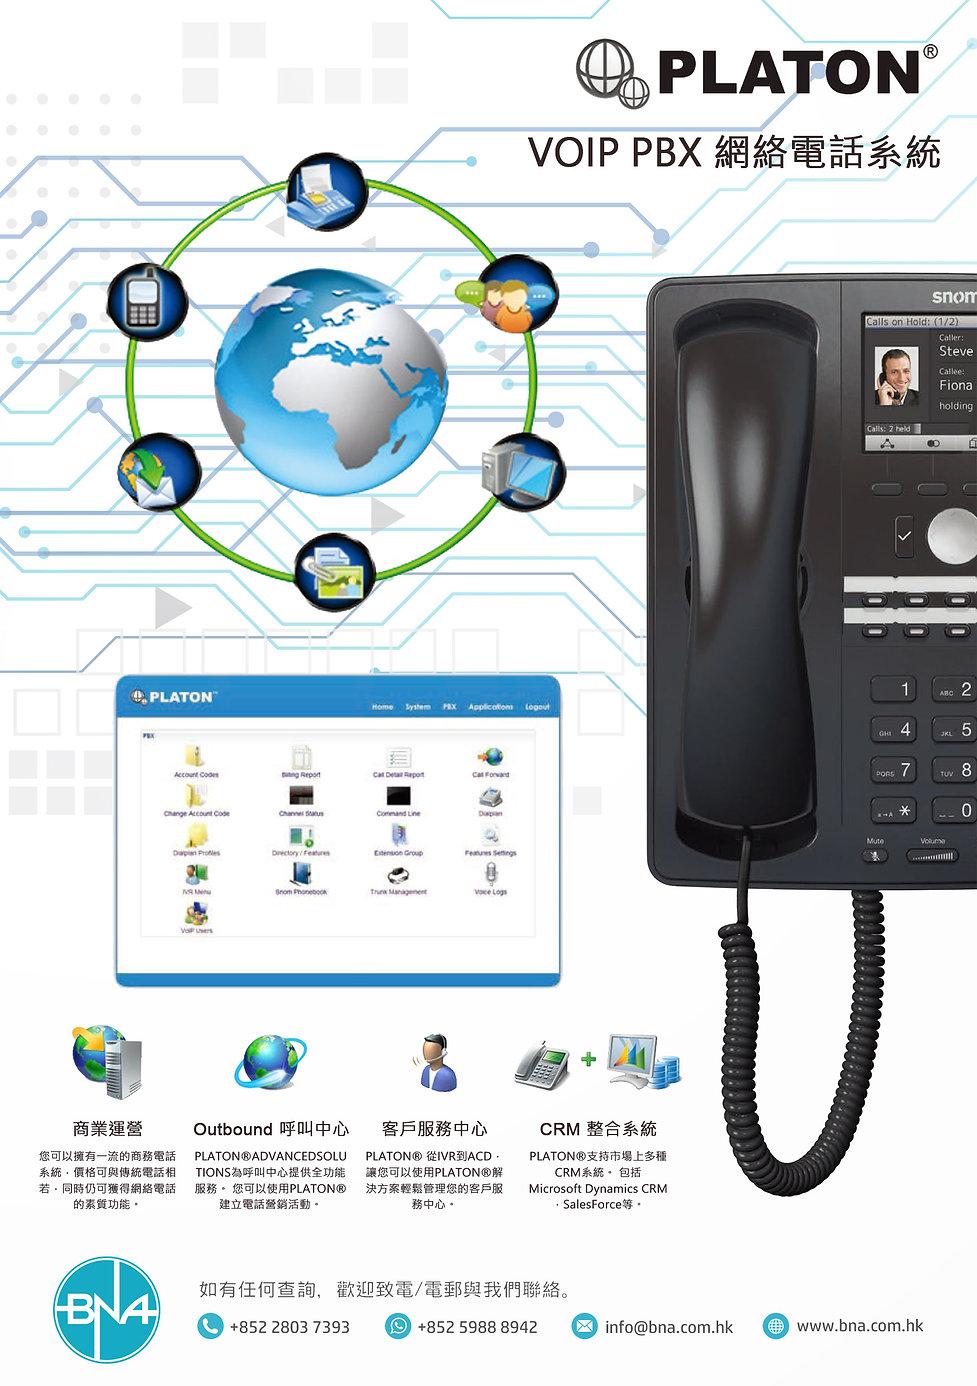 Platon VOIP PBX Phone System.jpg